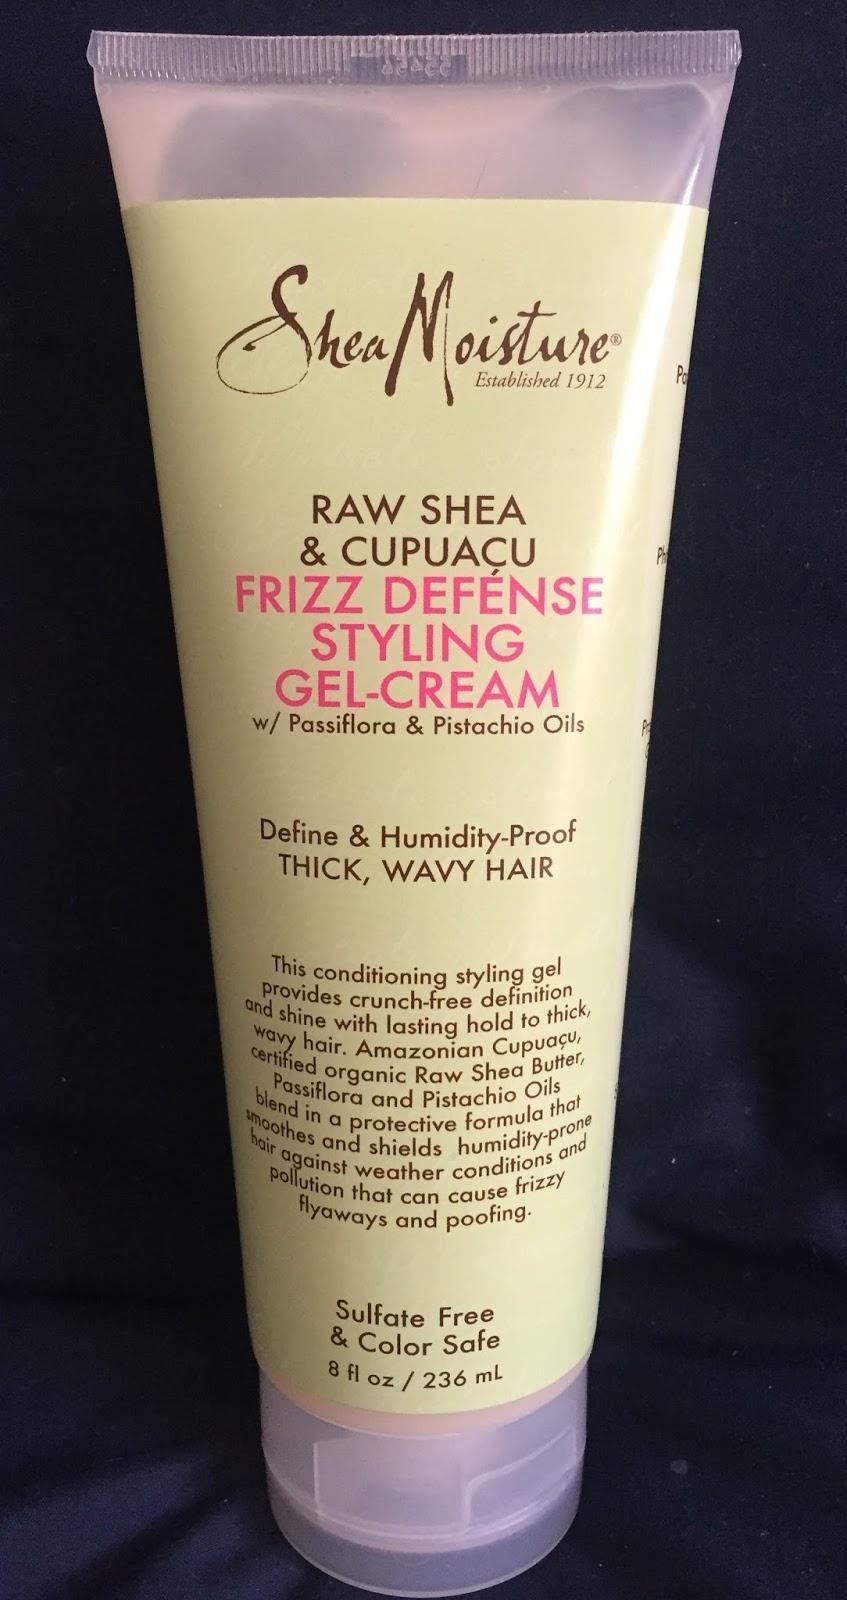 Styling Cream For Fine Hair Shea Moisture Raw Shea & Cupuacu Frizz Defense Line Initial Review .